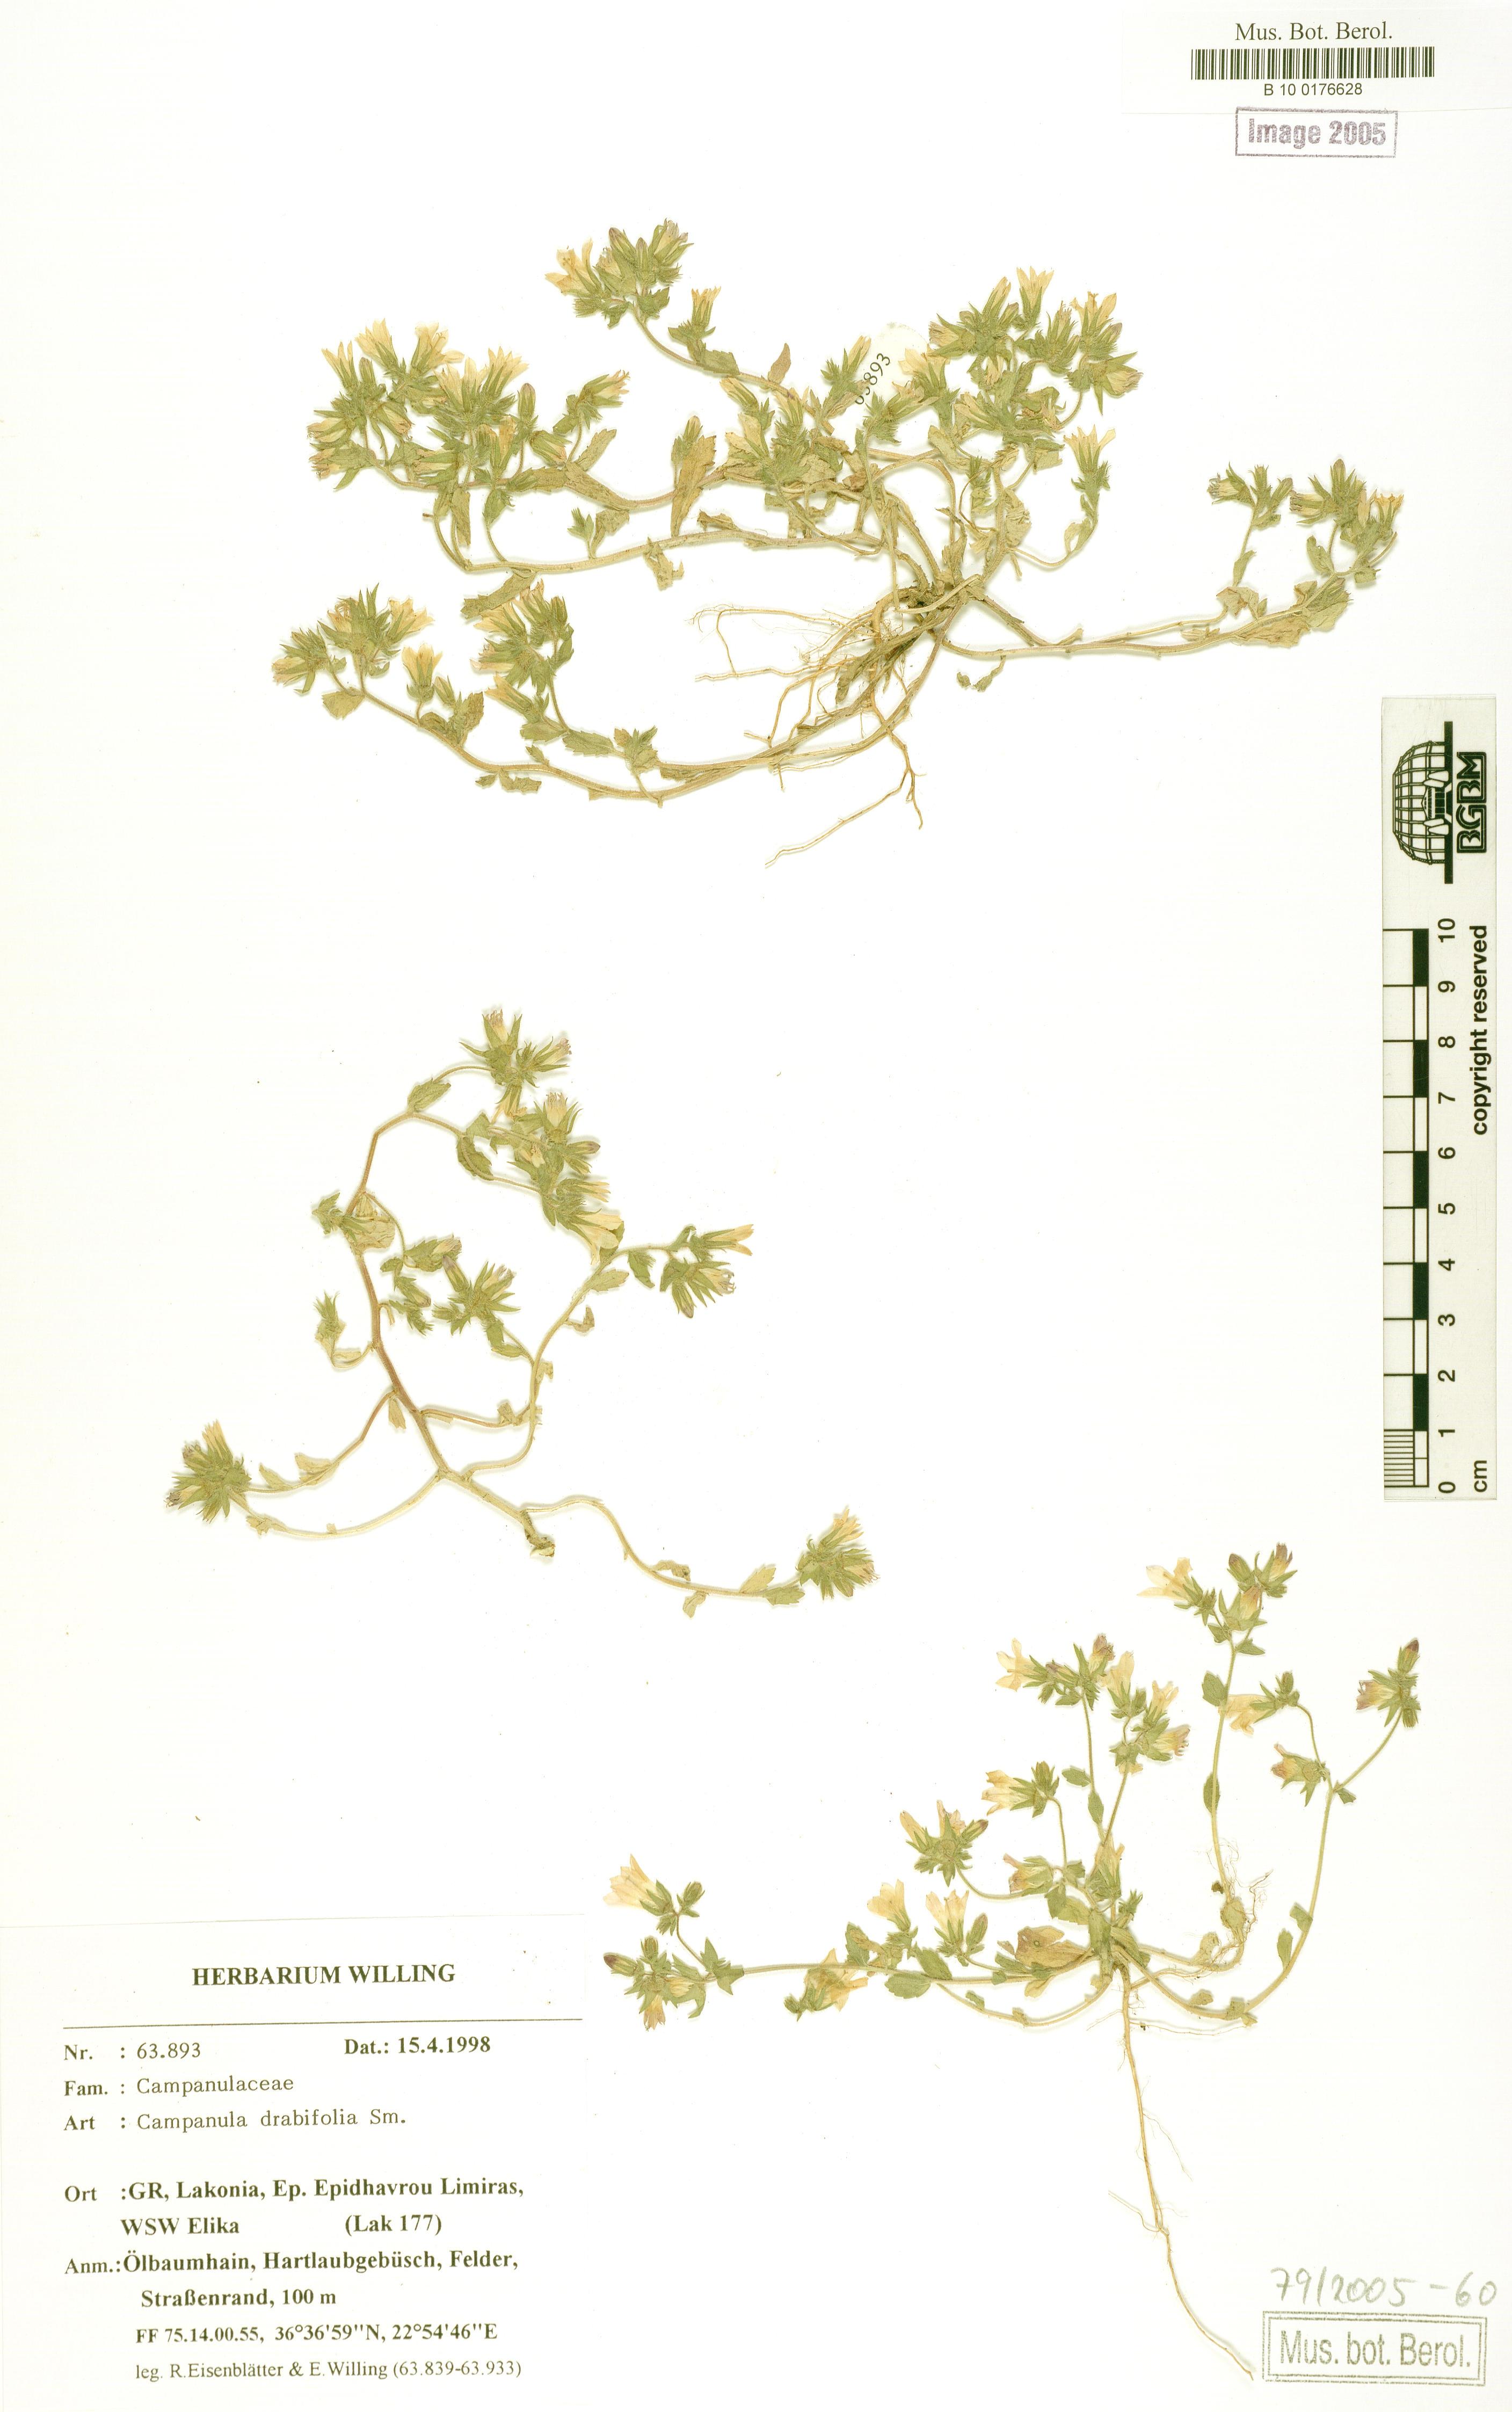 http://ww2.bgbm.org/herbarium/images/B/10/01/76/62/B_10_0176628.jpg